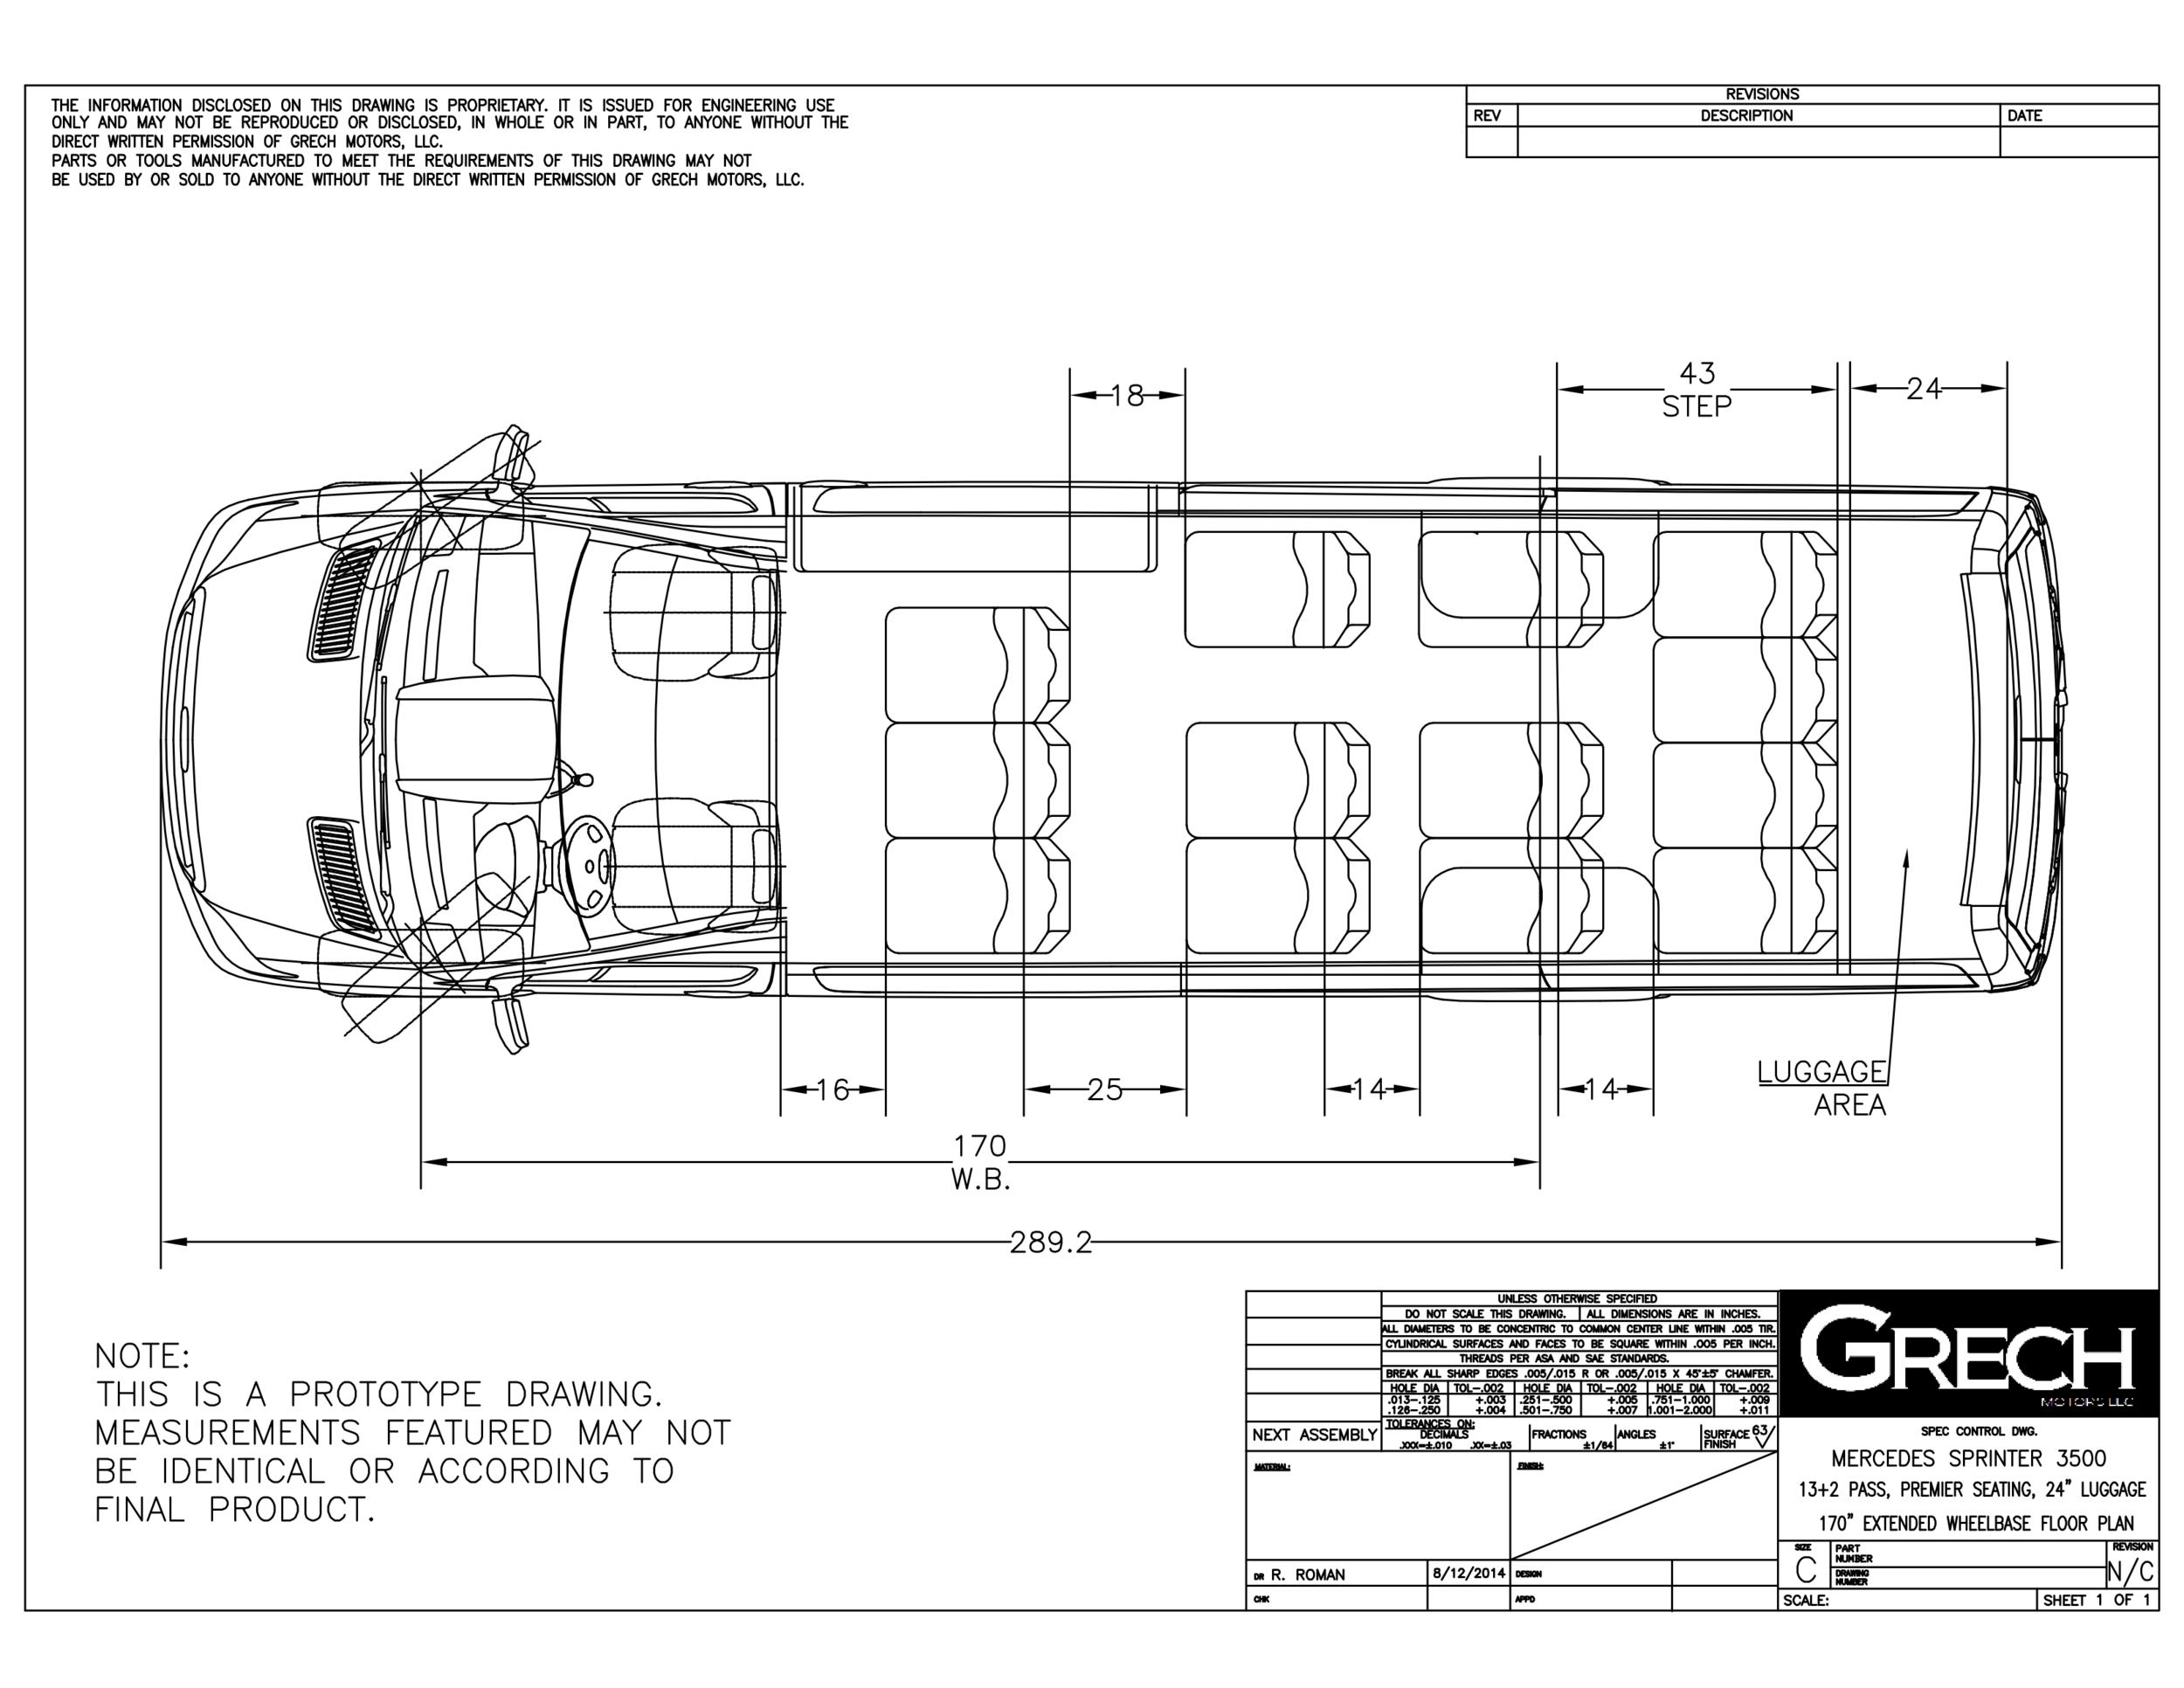 Sprinter 170WB 13+2 Pass, Premier Seat, 24in Lug. copy.png